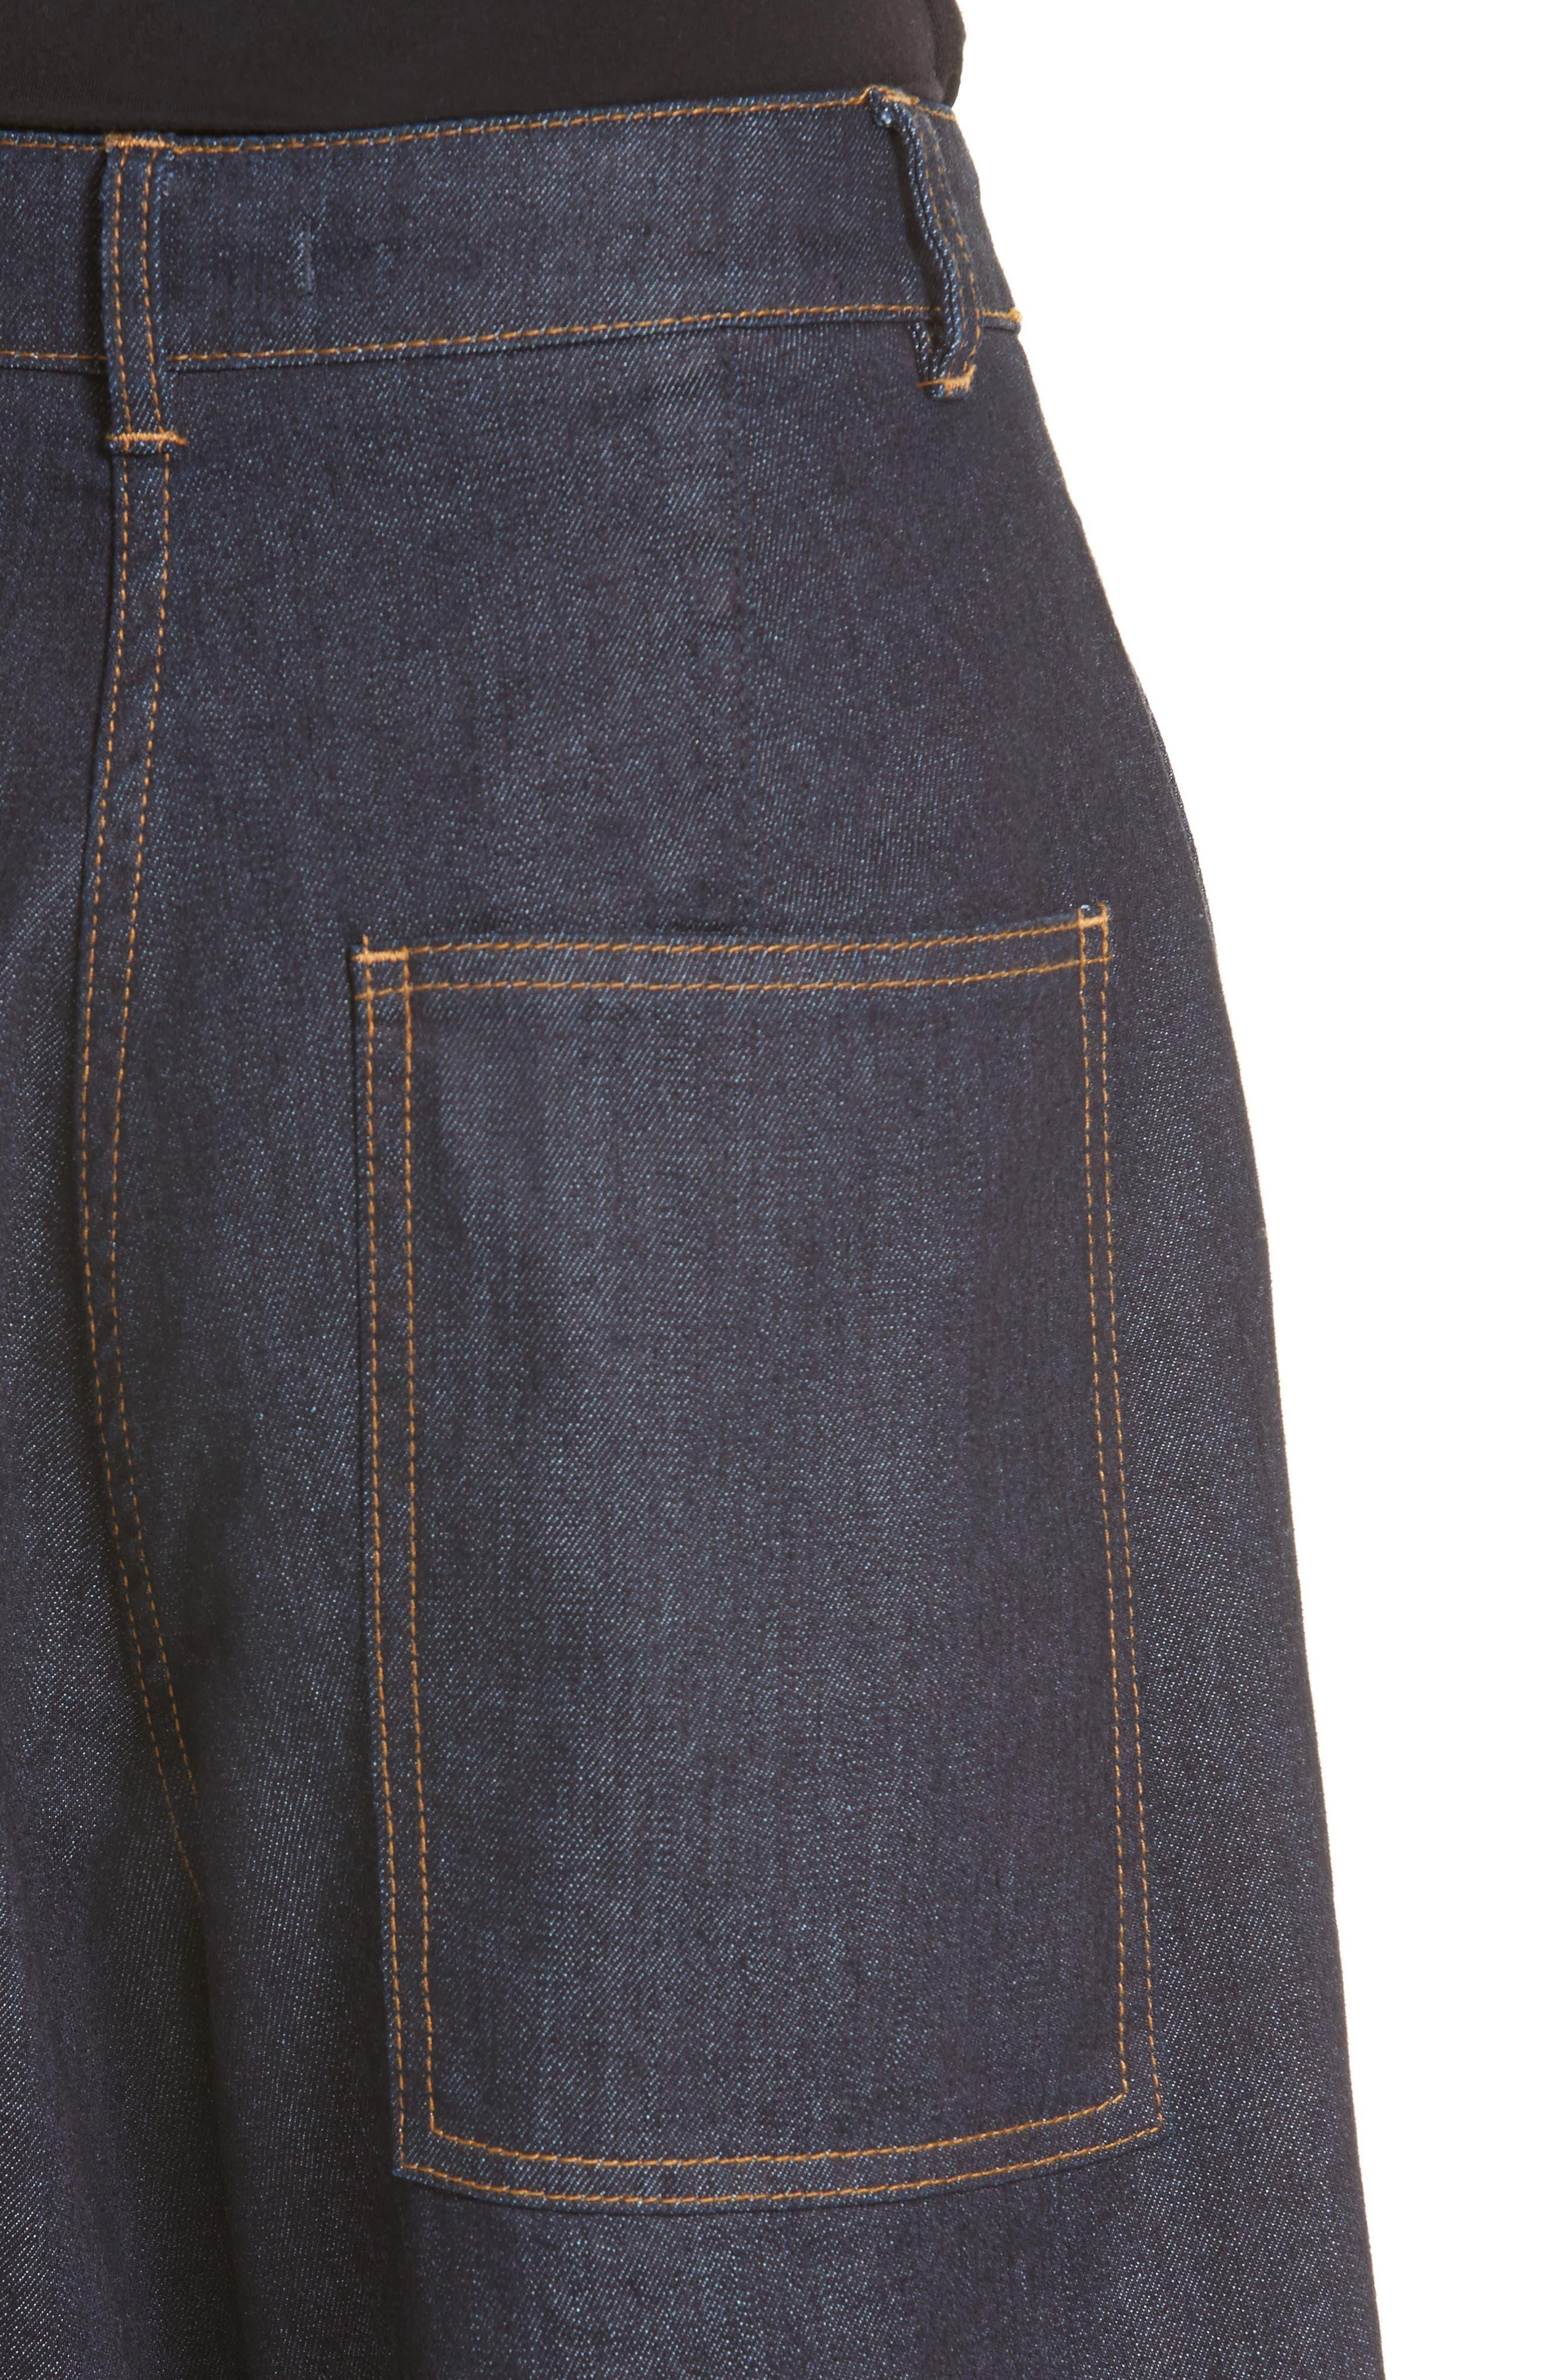 Sam High Waist Culotte Jeans,                             Alternate thumbnail 4, color,                             401